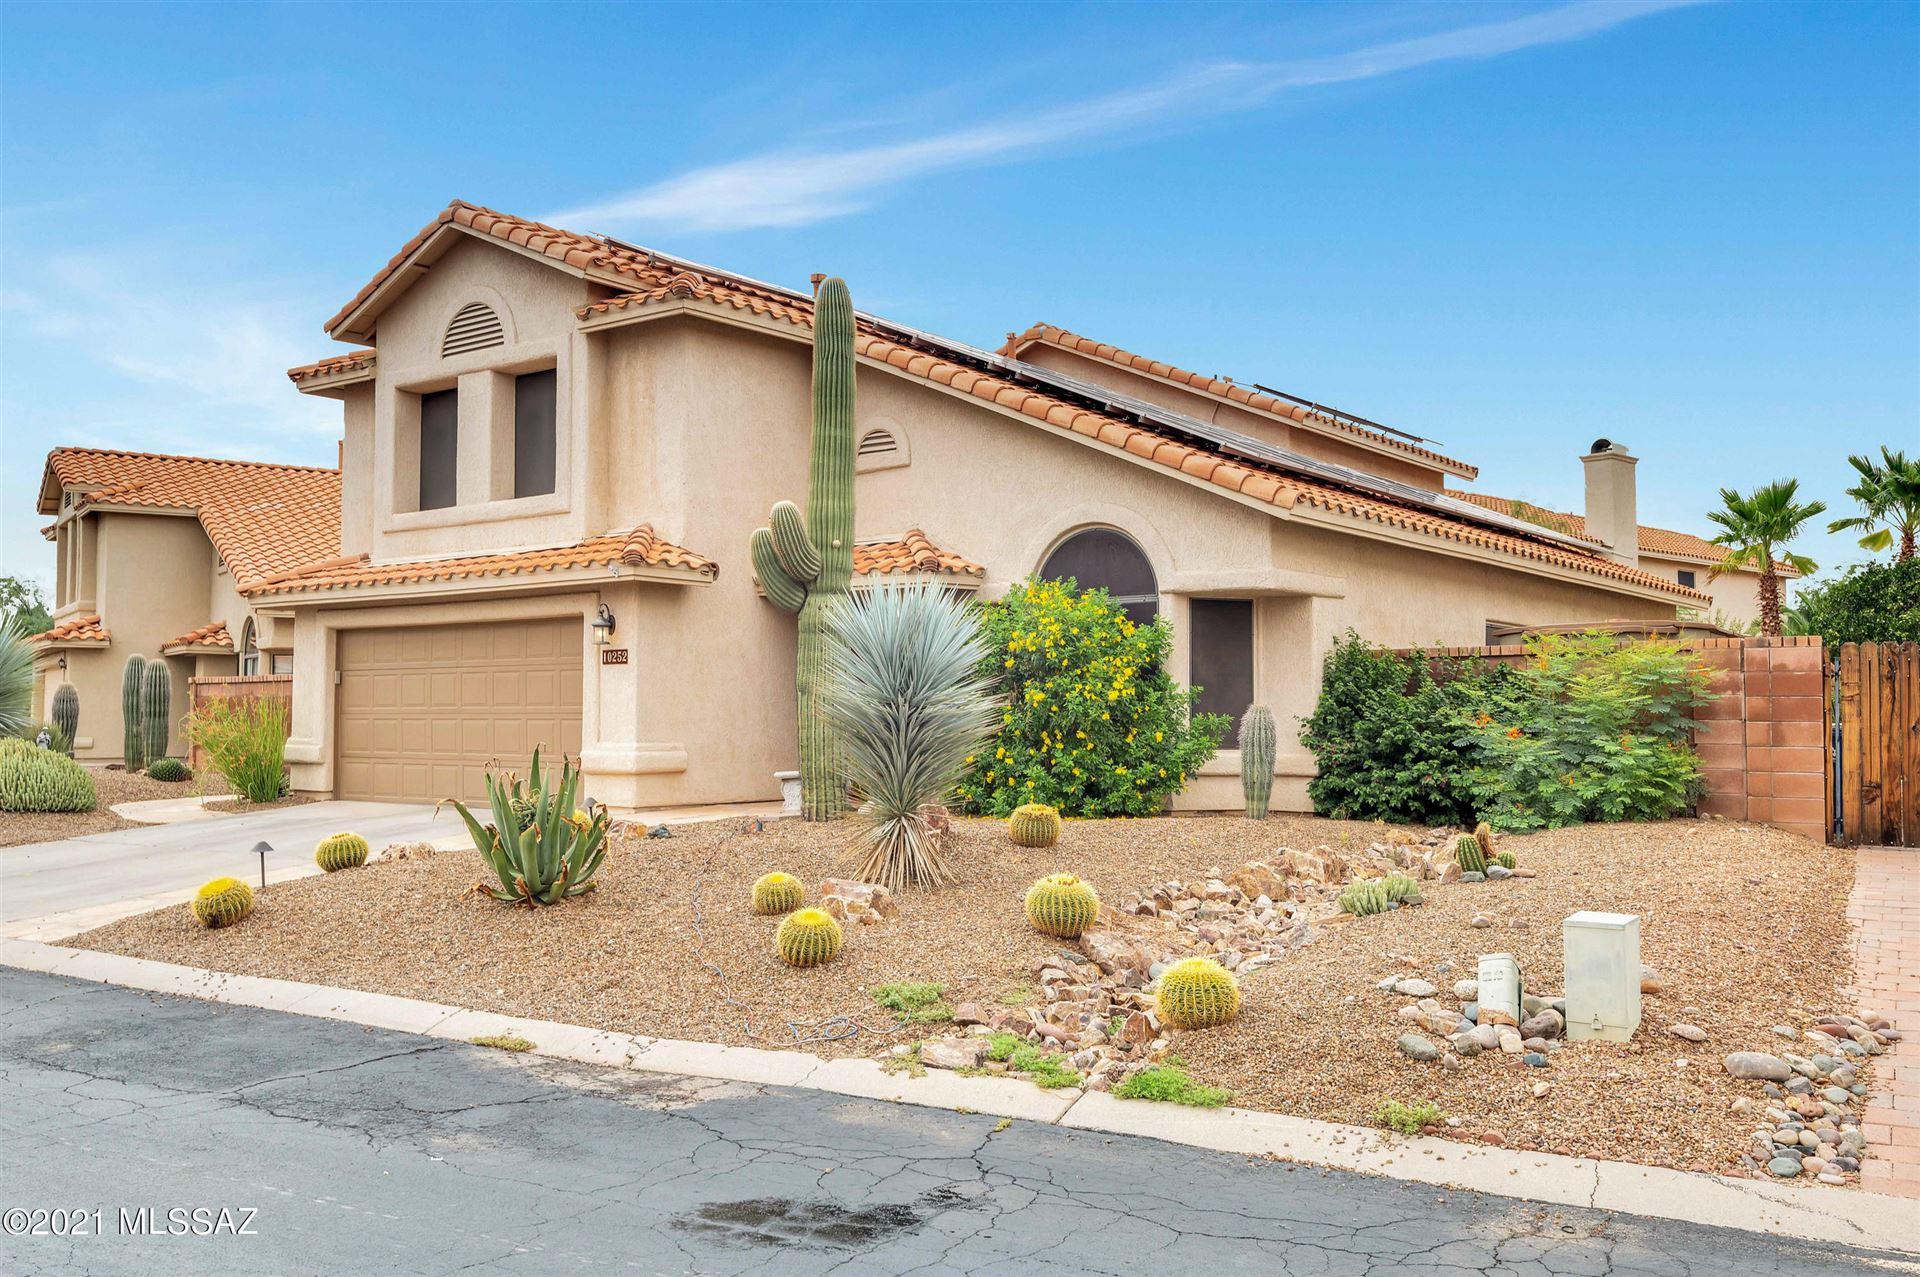 10252 N Cape Fear Lane, Tucson, AZ 85737 - MLS#: 22119527